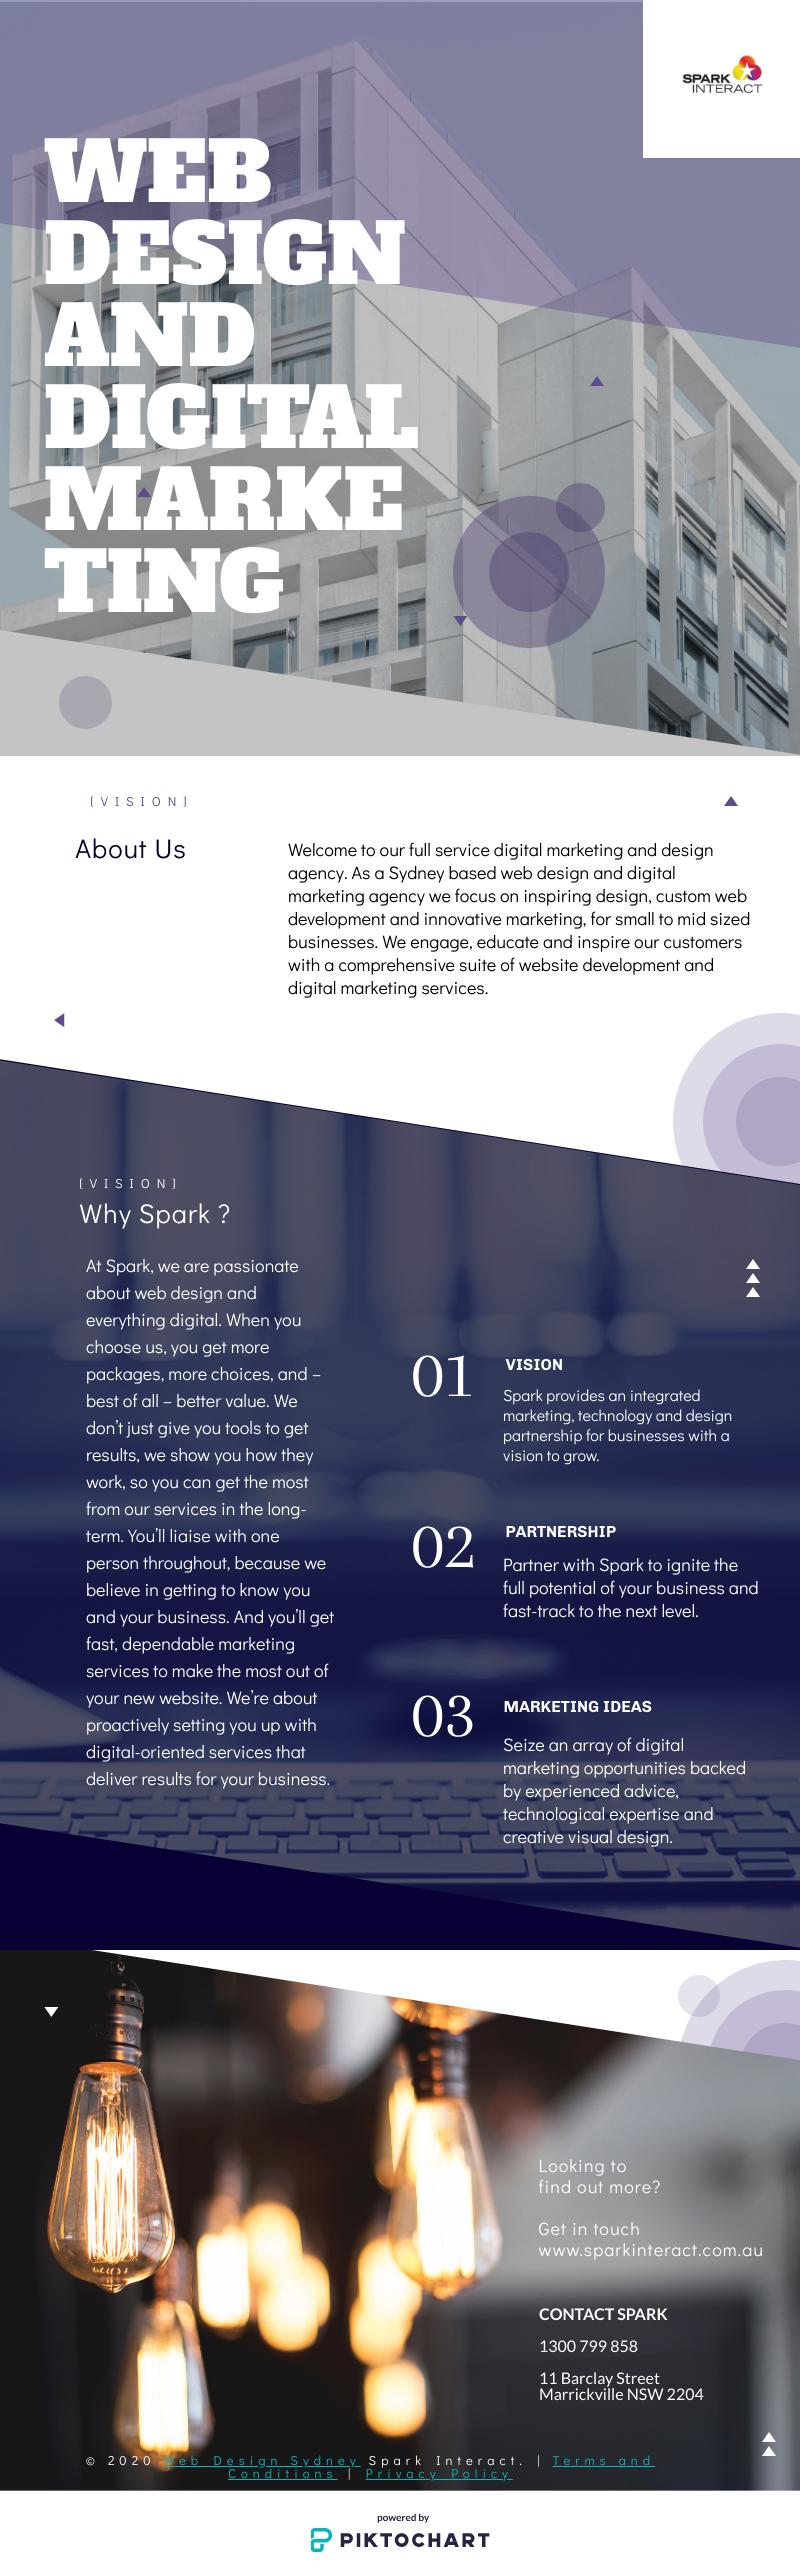 The 1 Sydney Web Design Services Australia Spark Interact In 2020 Digital Marketing Design Web Design Web Design Services